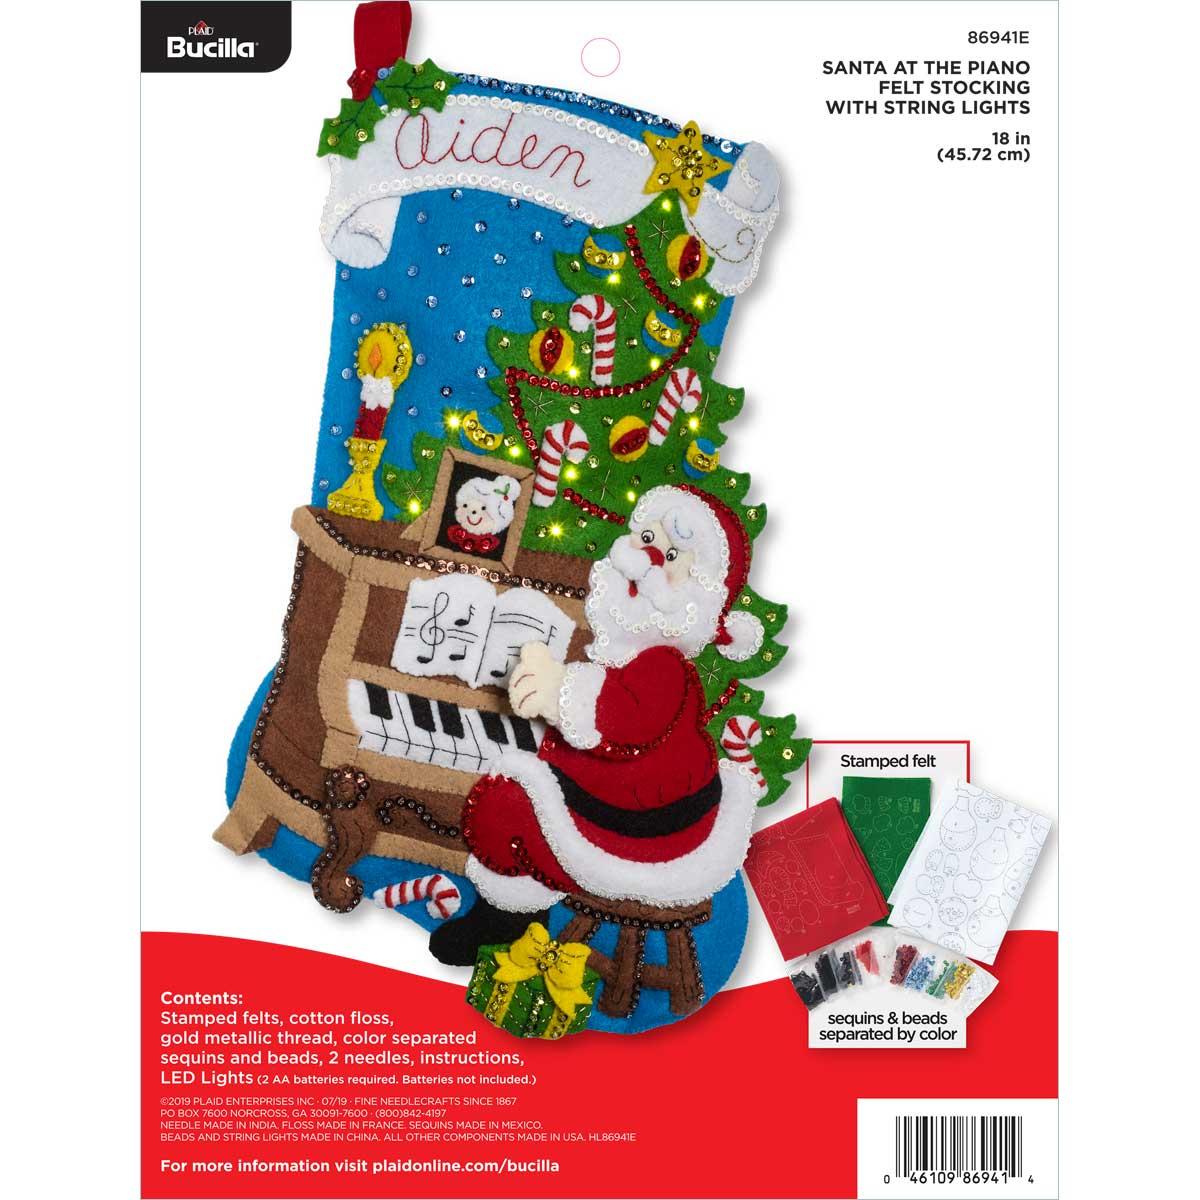 Bucilla Christmas Stocking Kits.Bucilla Seasonal Felt Stocking Kits Santa At The Piano With Lights